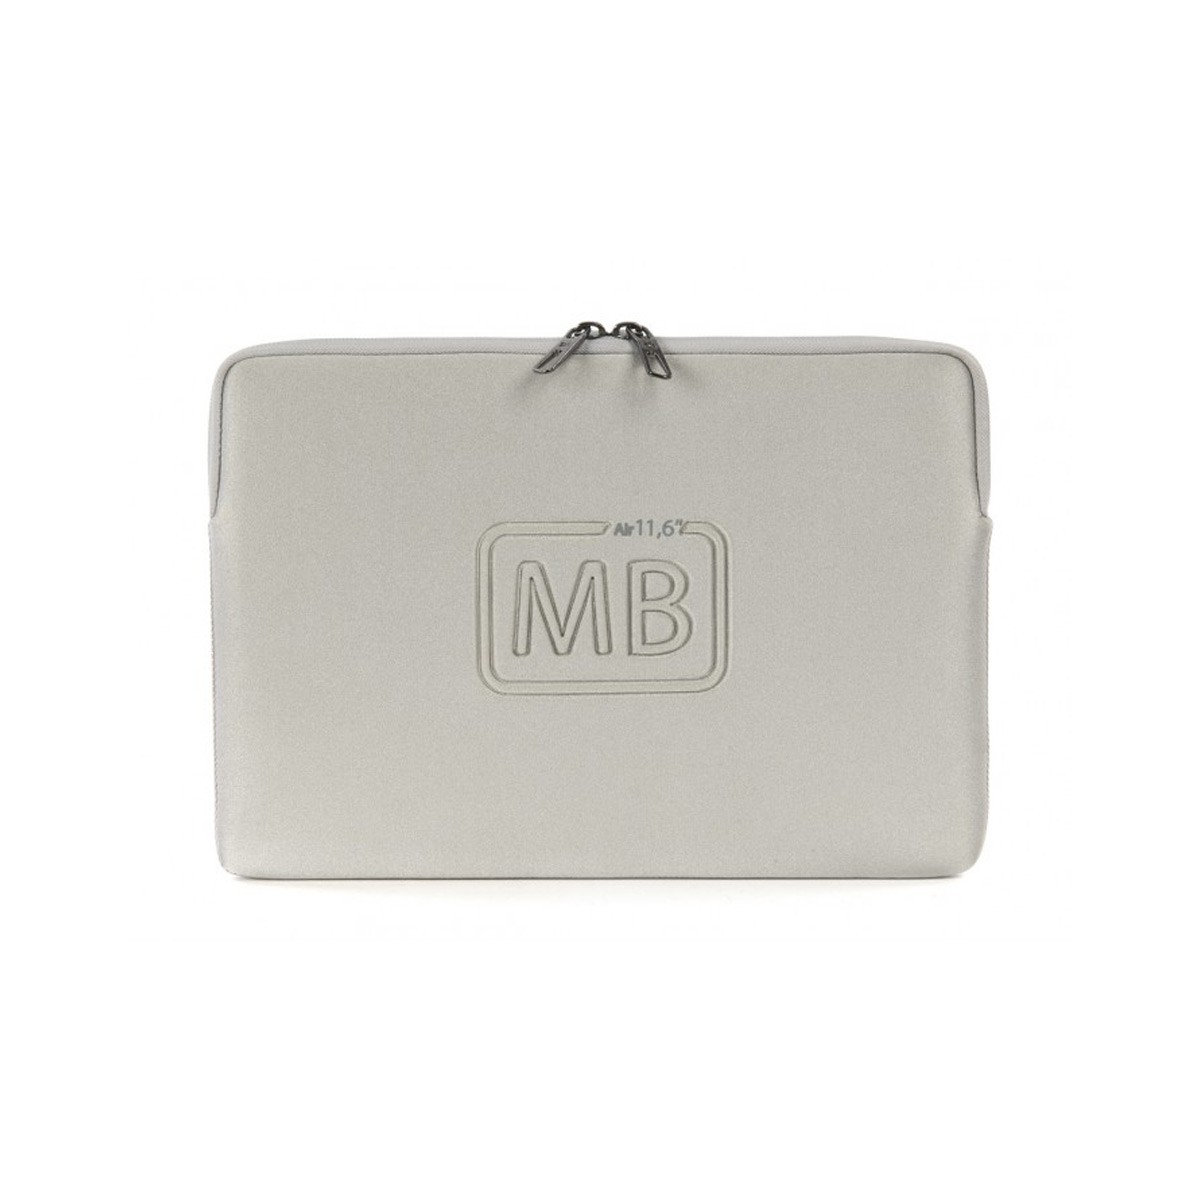 "Obal pro MacBook Air 11"" Tucano New Elements, neoprenový - stříbrný"